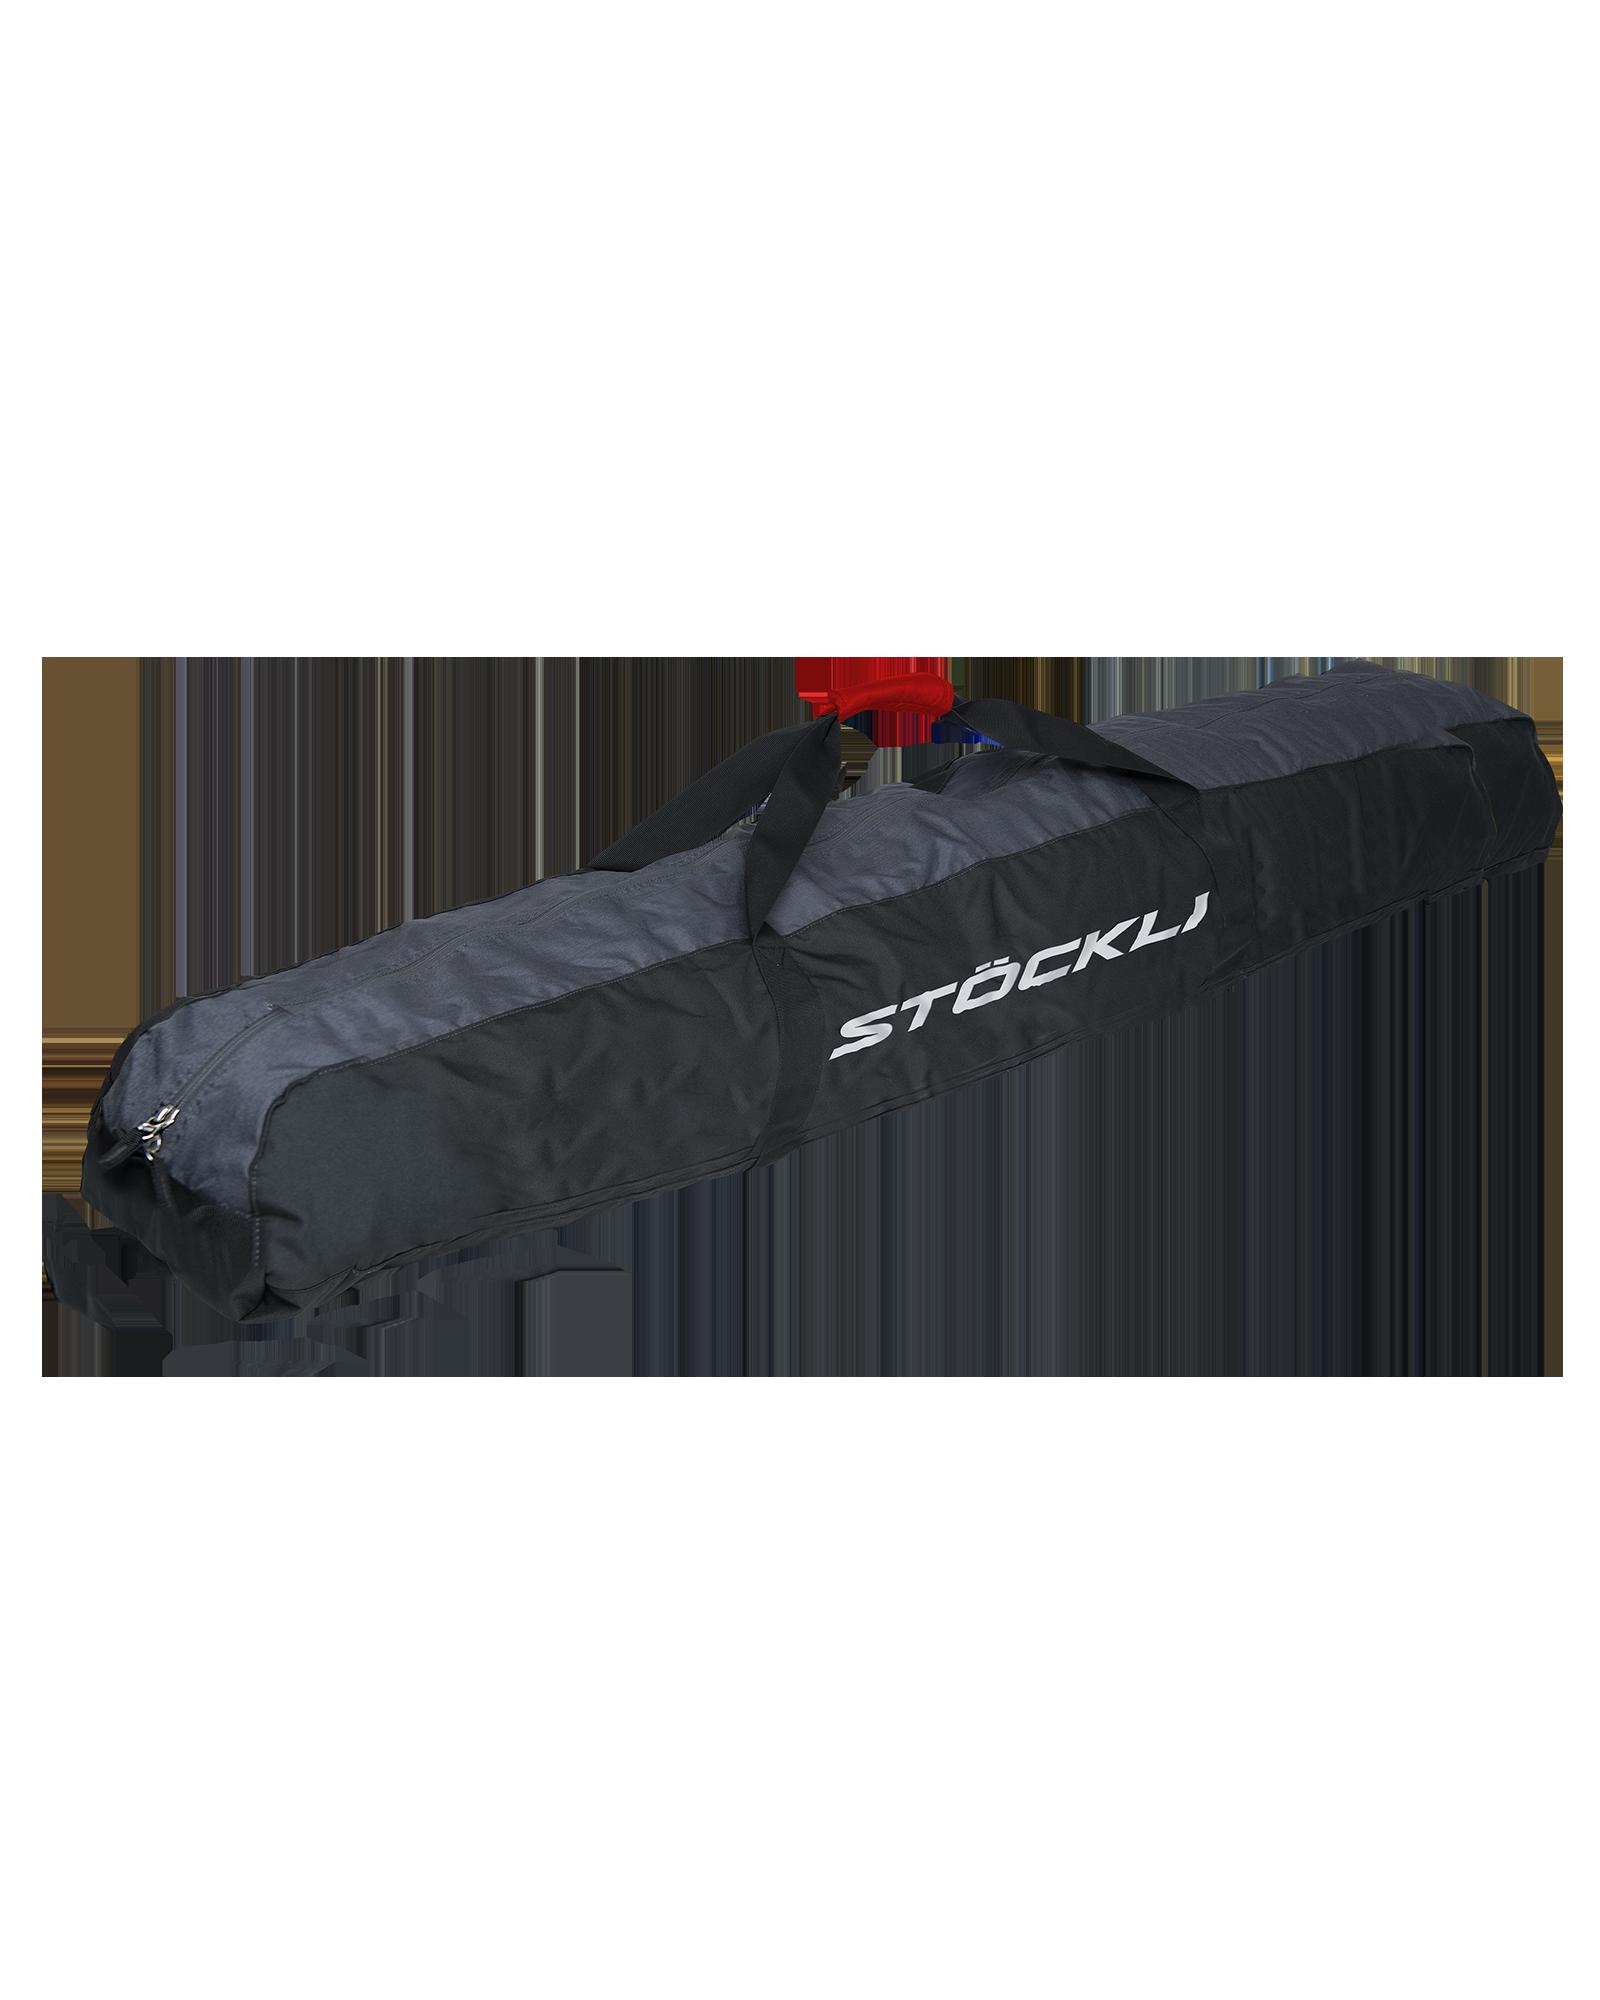 Stöckli Skisack - Sport Nenner / Skibuy.at